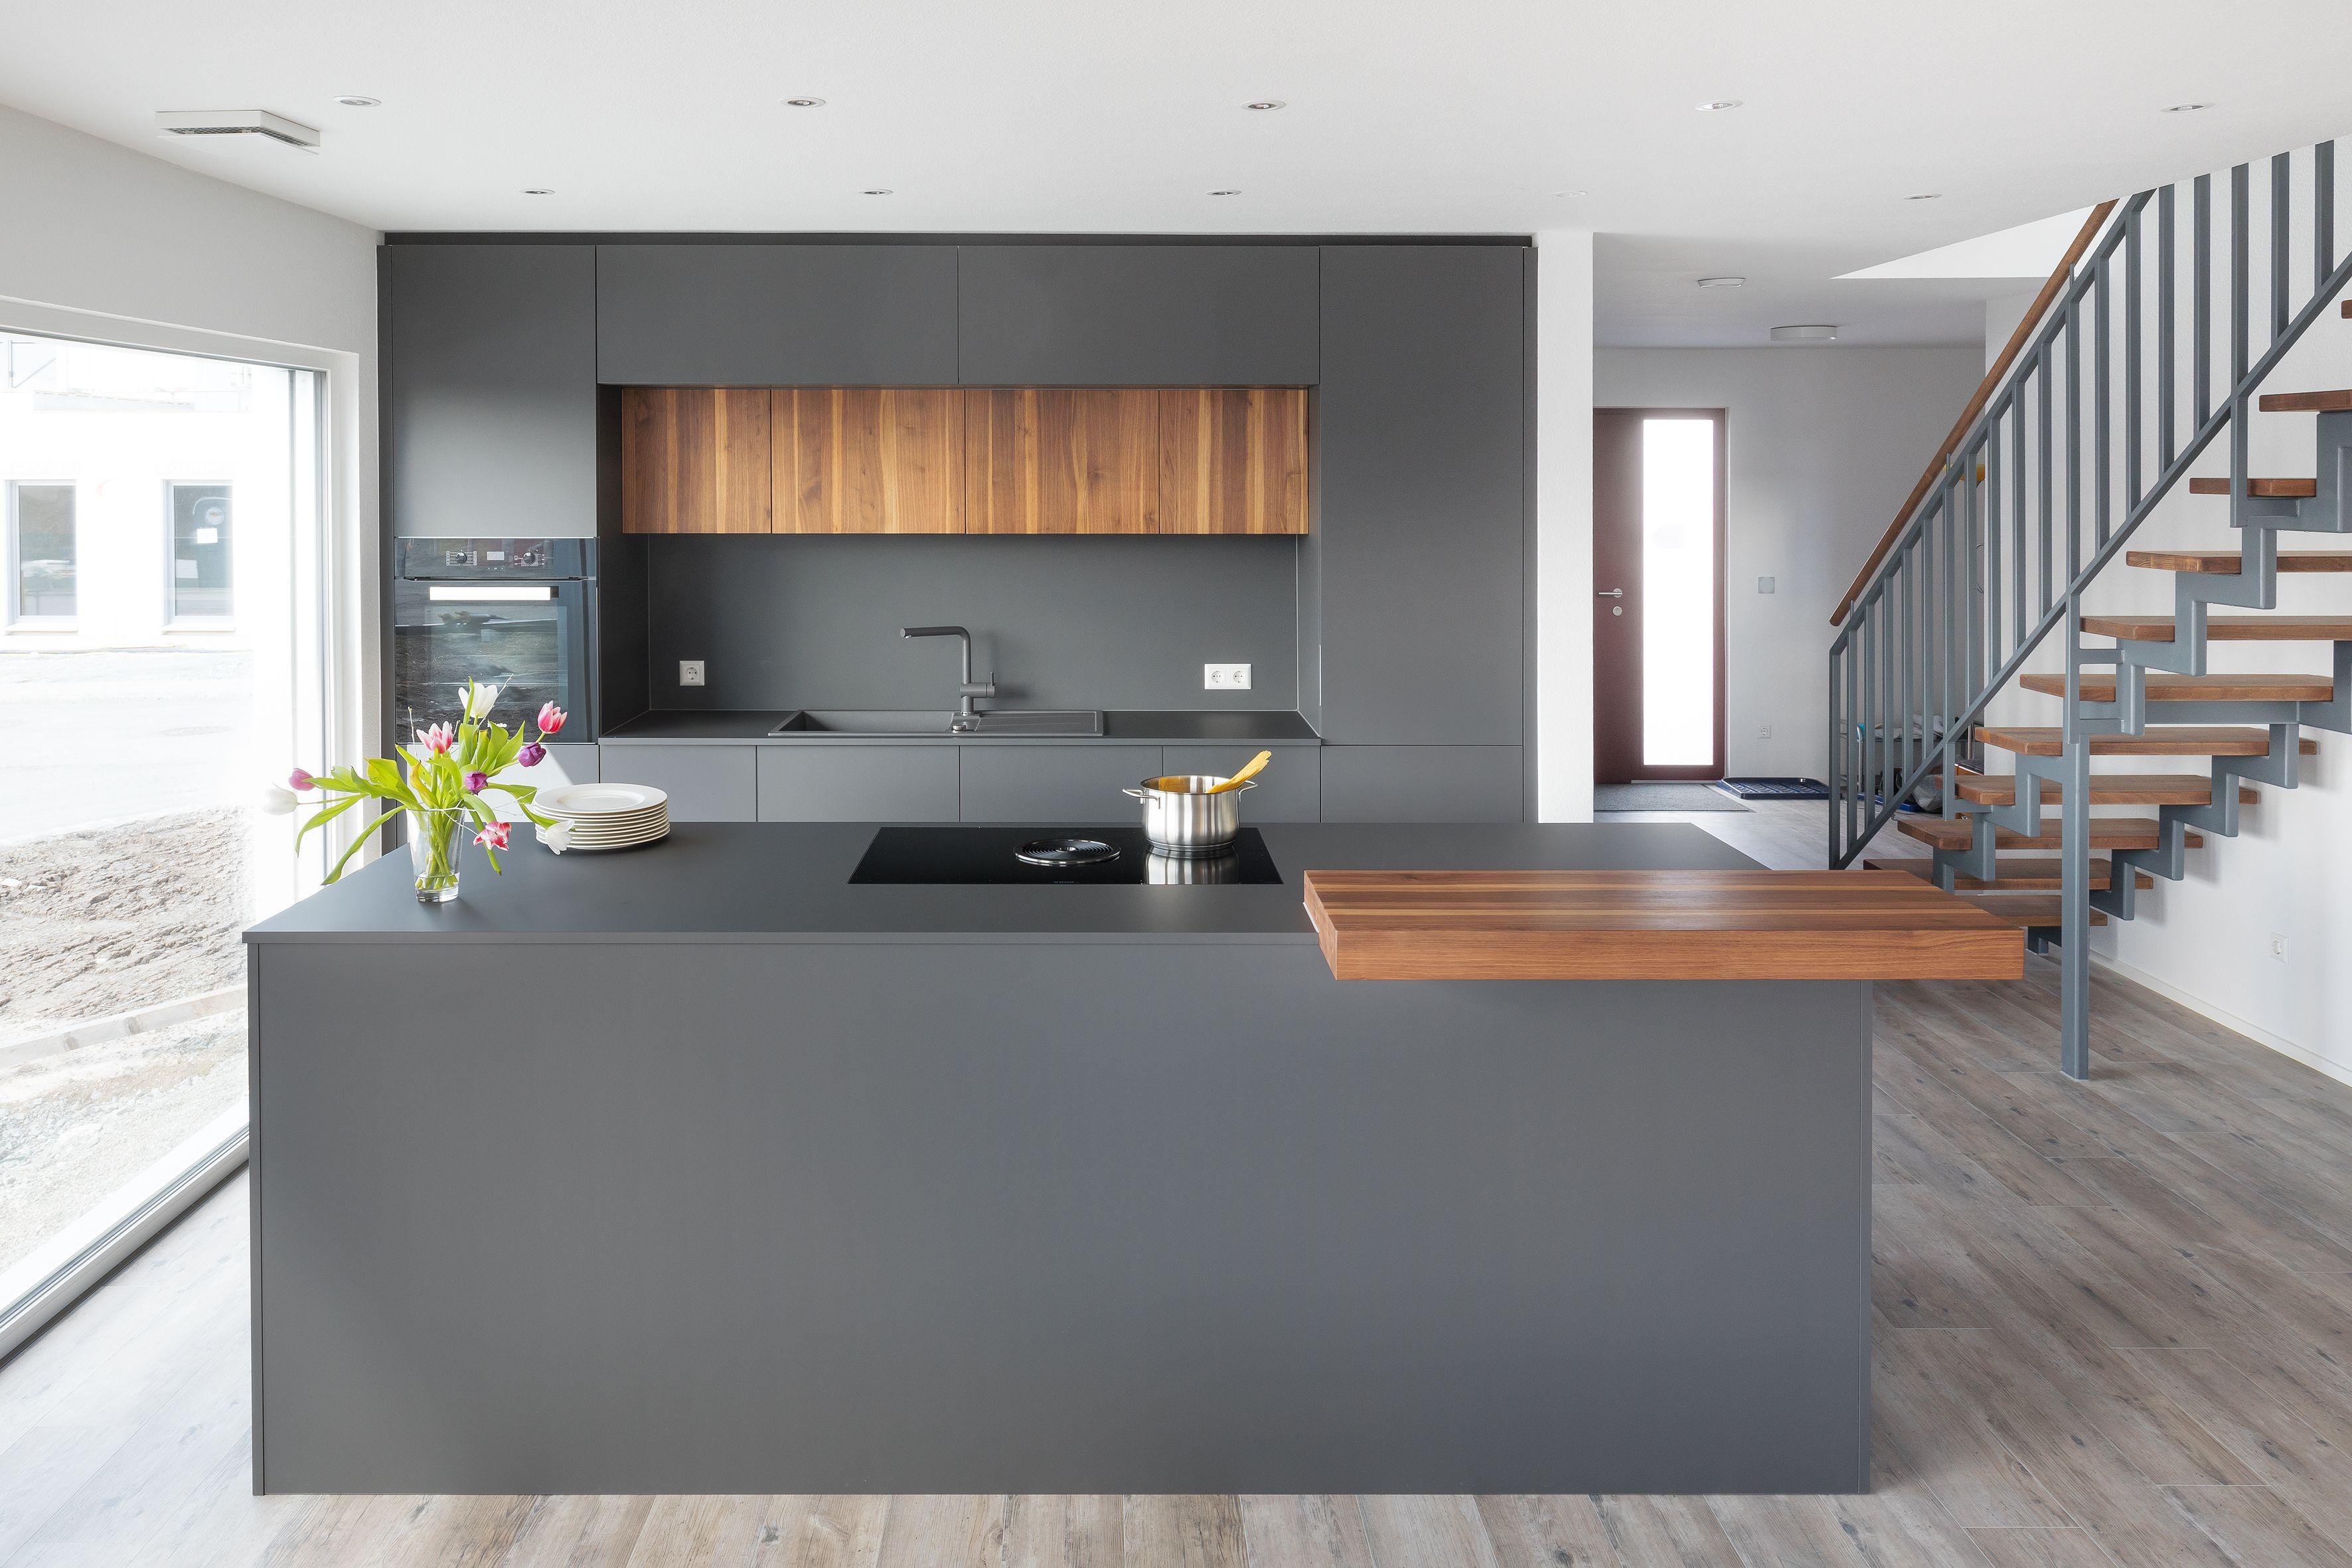 kücheninsel | kochinsel | grau | designerküche | design